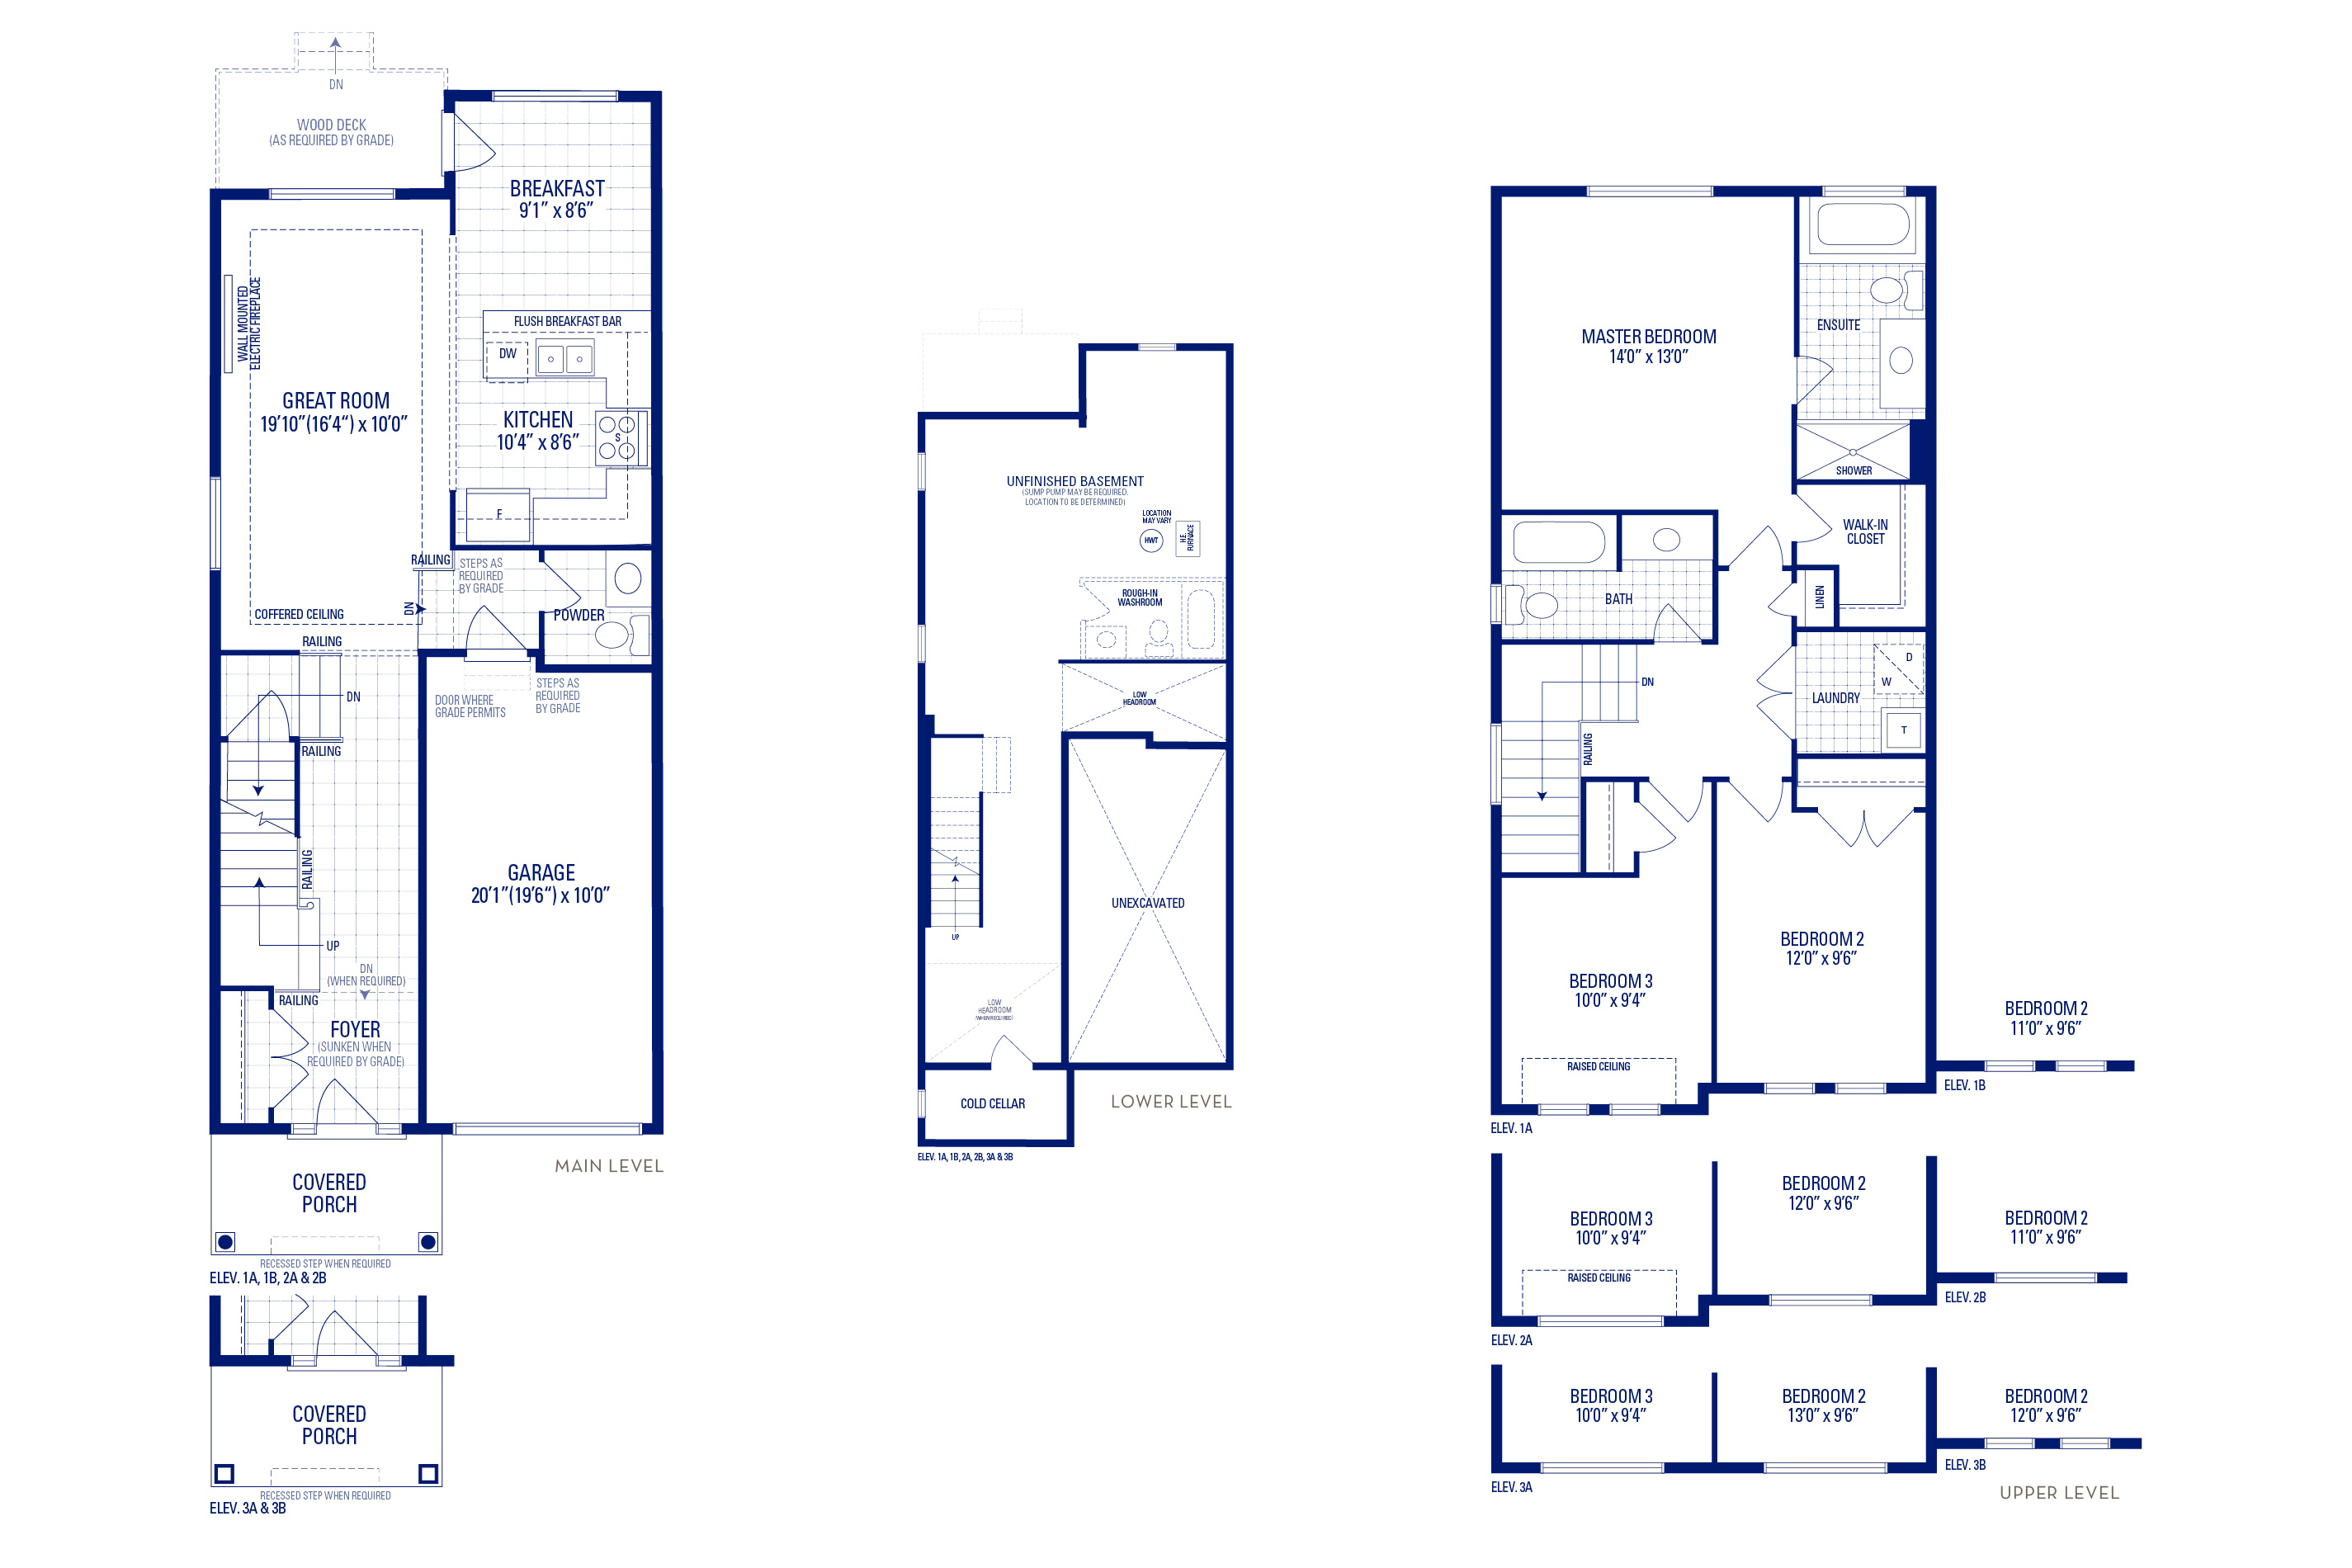 Glendale 2 Elev. 3A Floorplan